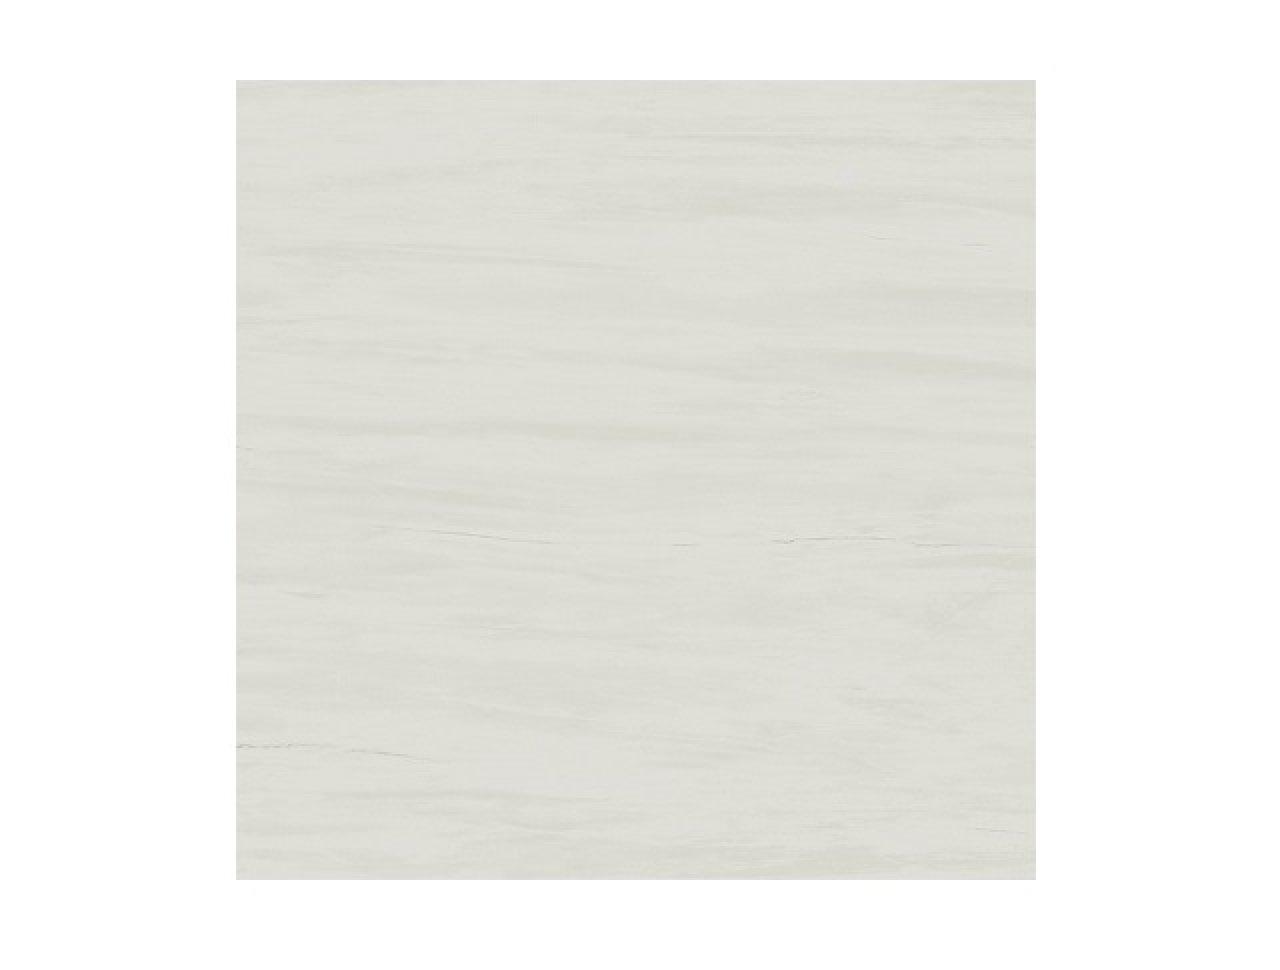 Напольная плитка Marvel Bianco Dolomite Lapp. 60x60